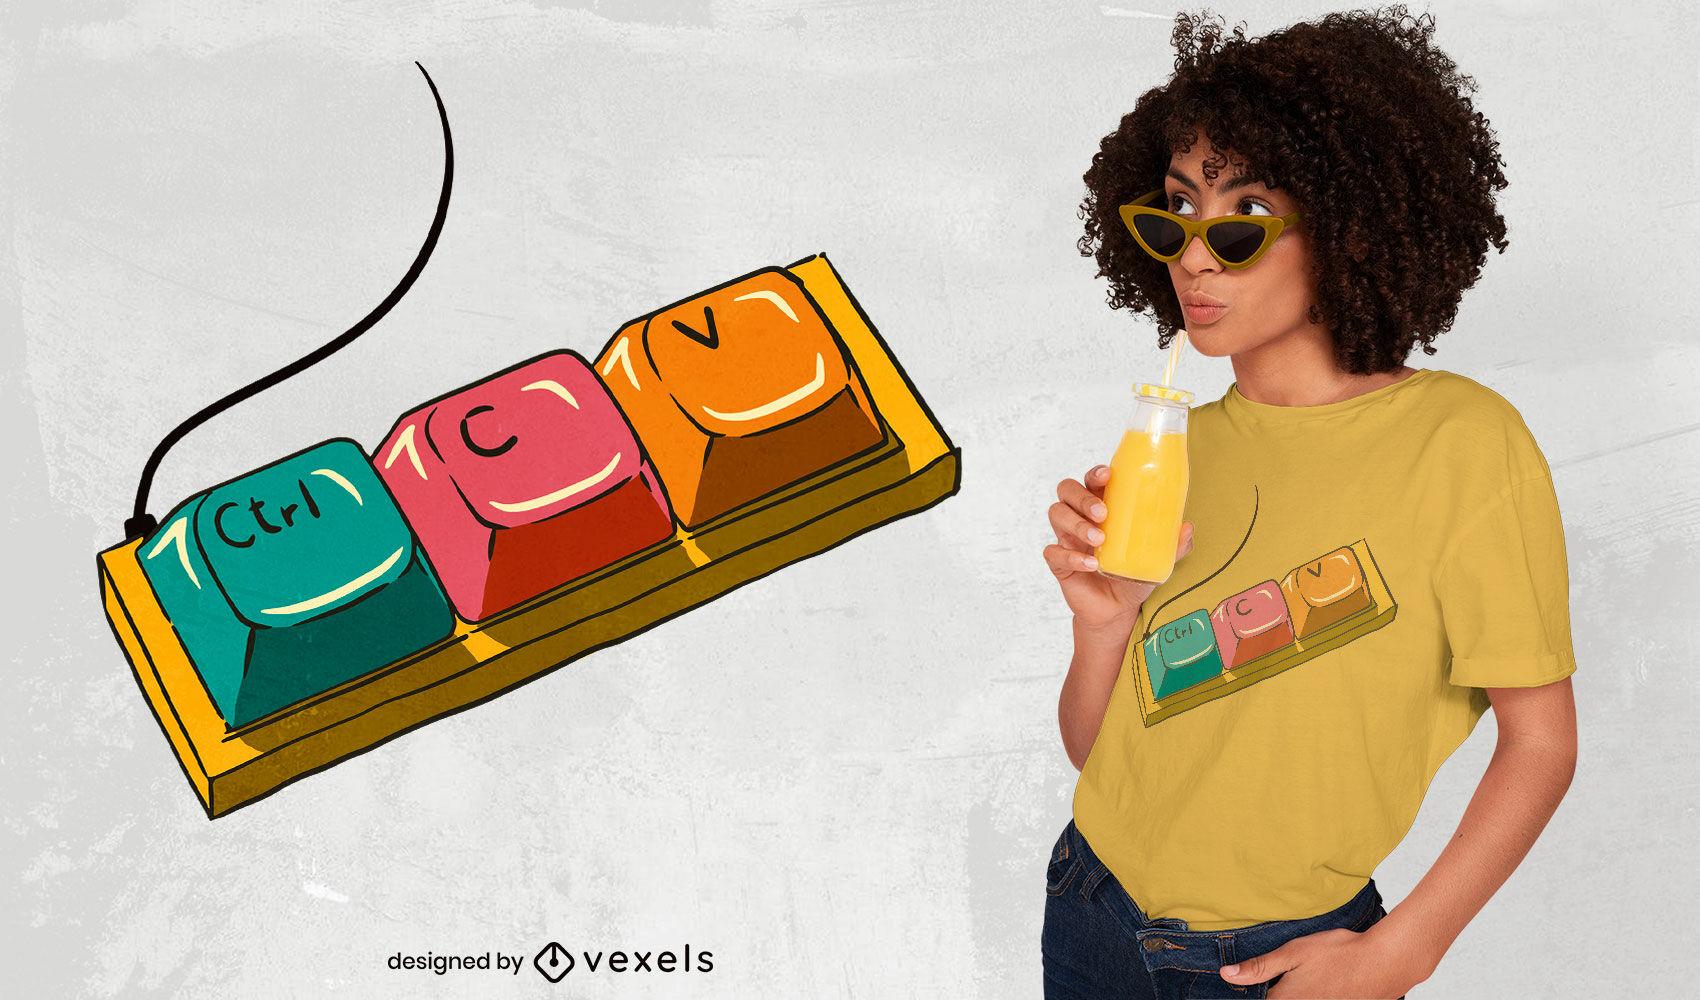 Cool keayboard keys t-shirt design